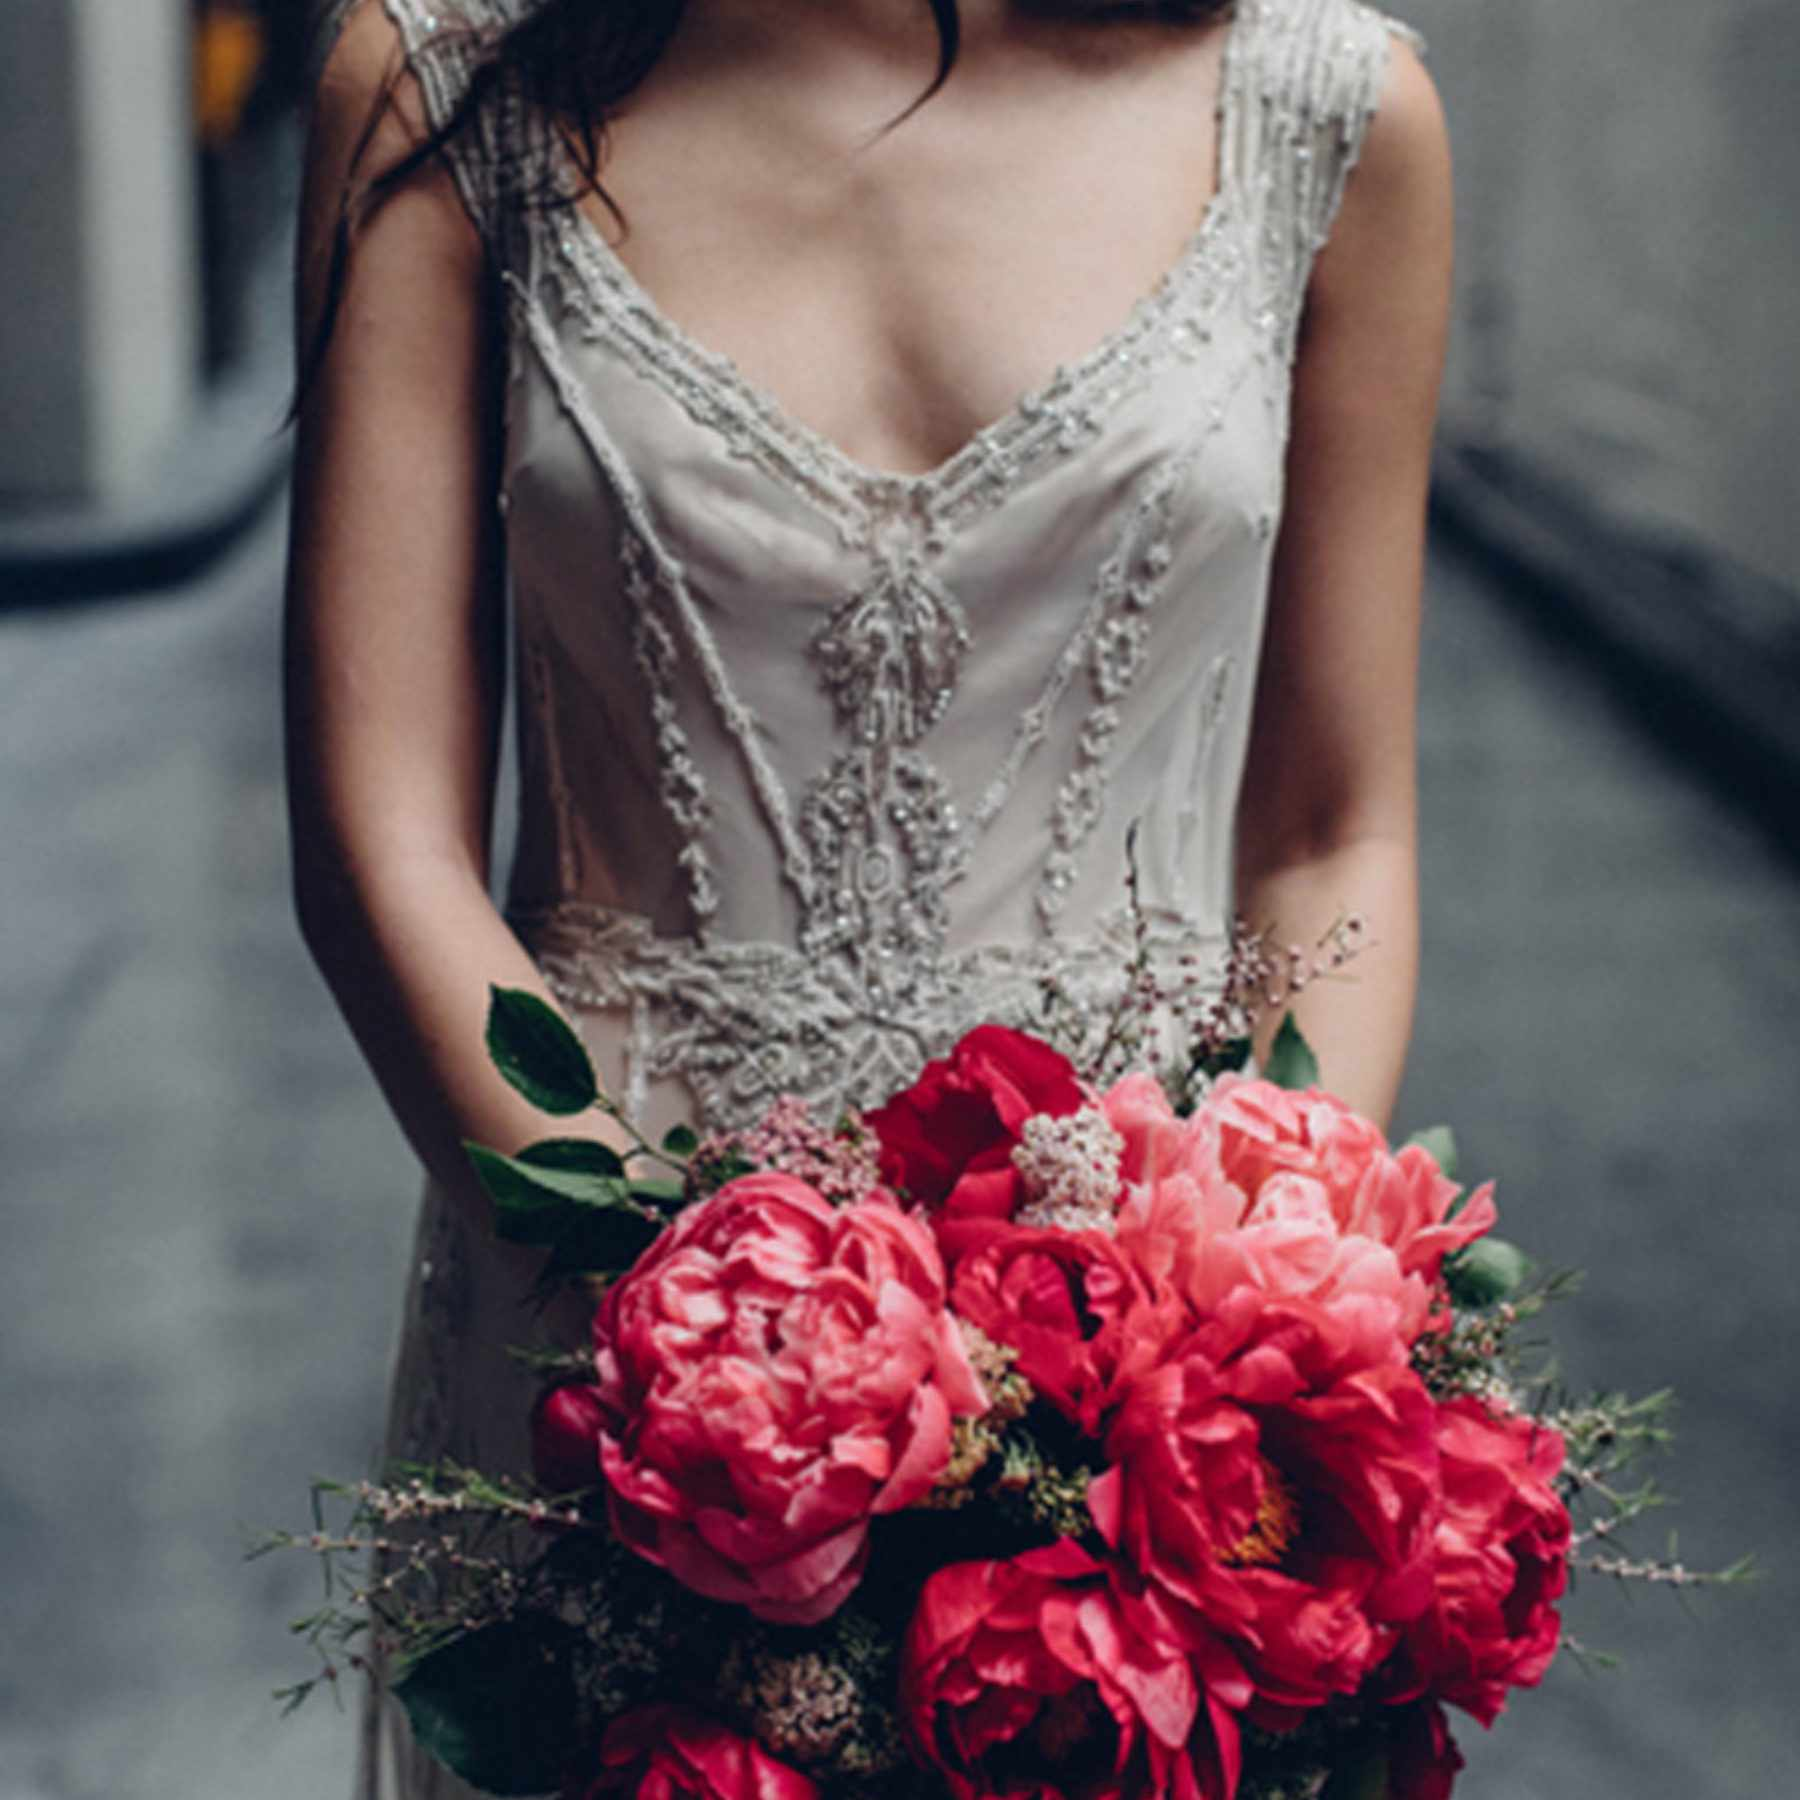 Monochrome Peony bouquet